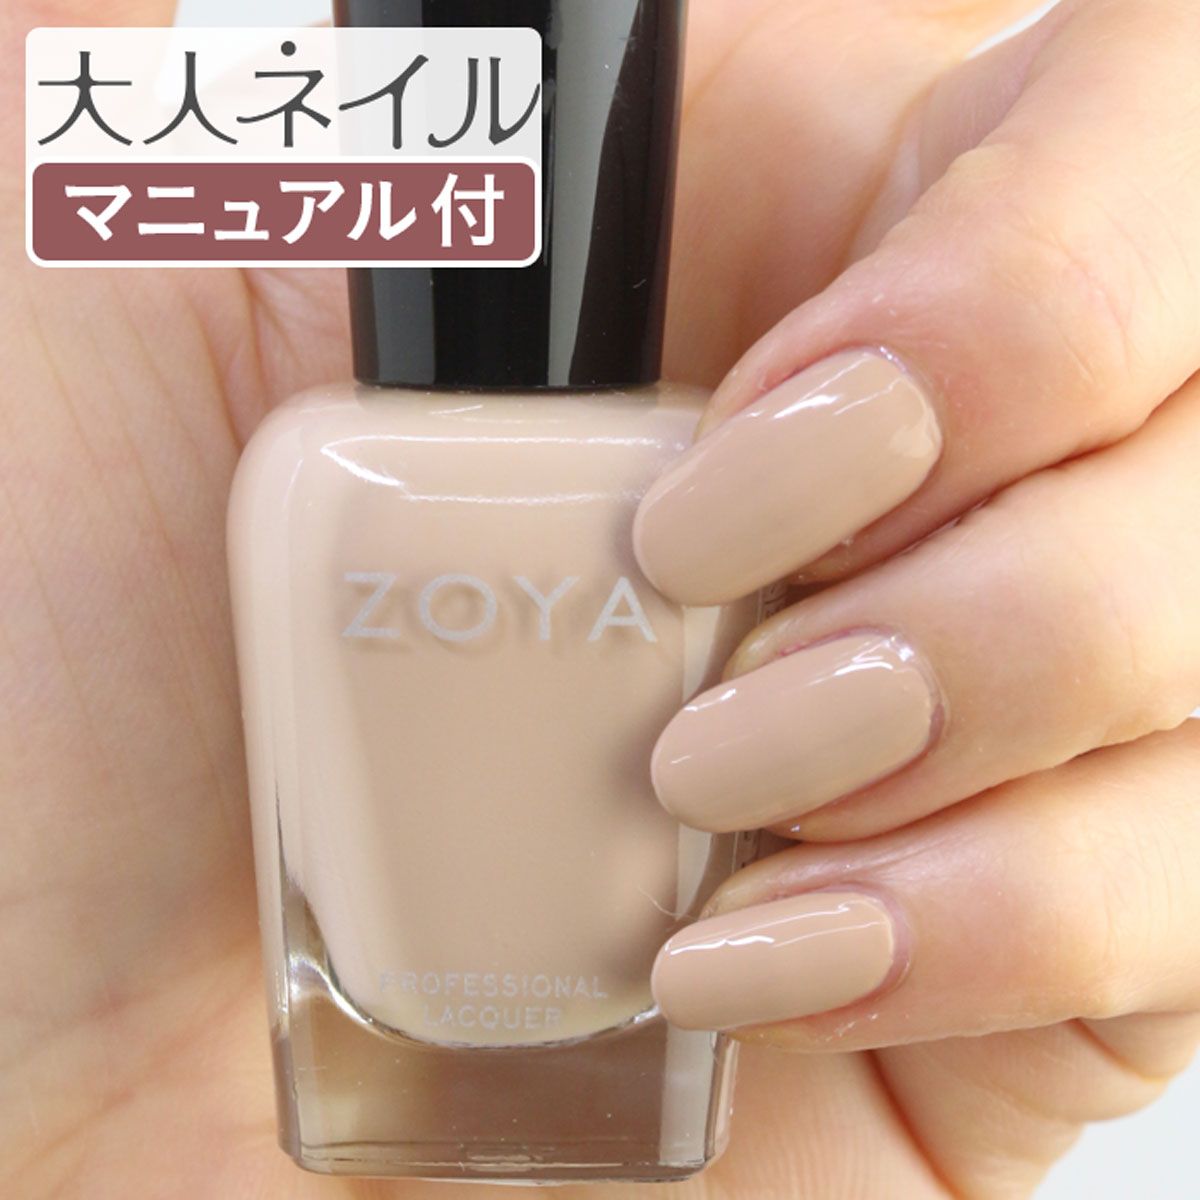 ZOYA ゾーヤ ゾヤ ネイルカラー ZP1014 15mL ENZA 自爪 の為に作られた ネイル にやさしい 自然派 マニキュア zoya セルフネイル にもおすすめ ナッツ ベージュ オフィス